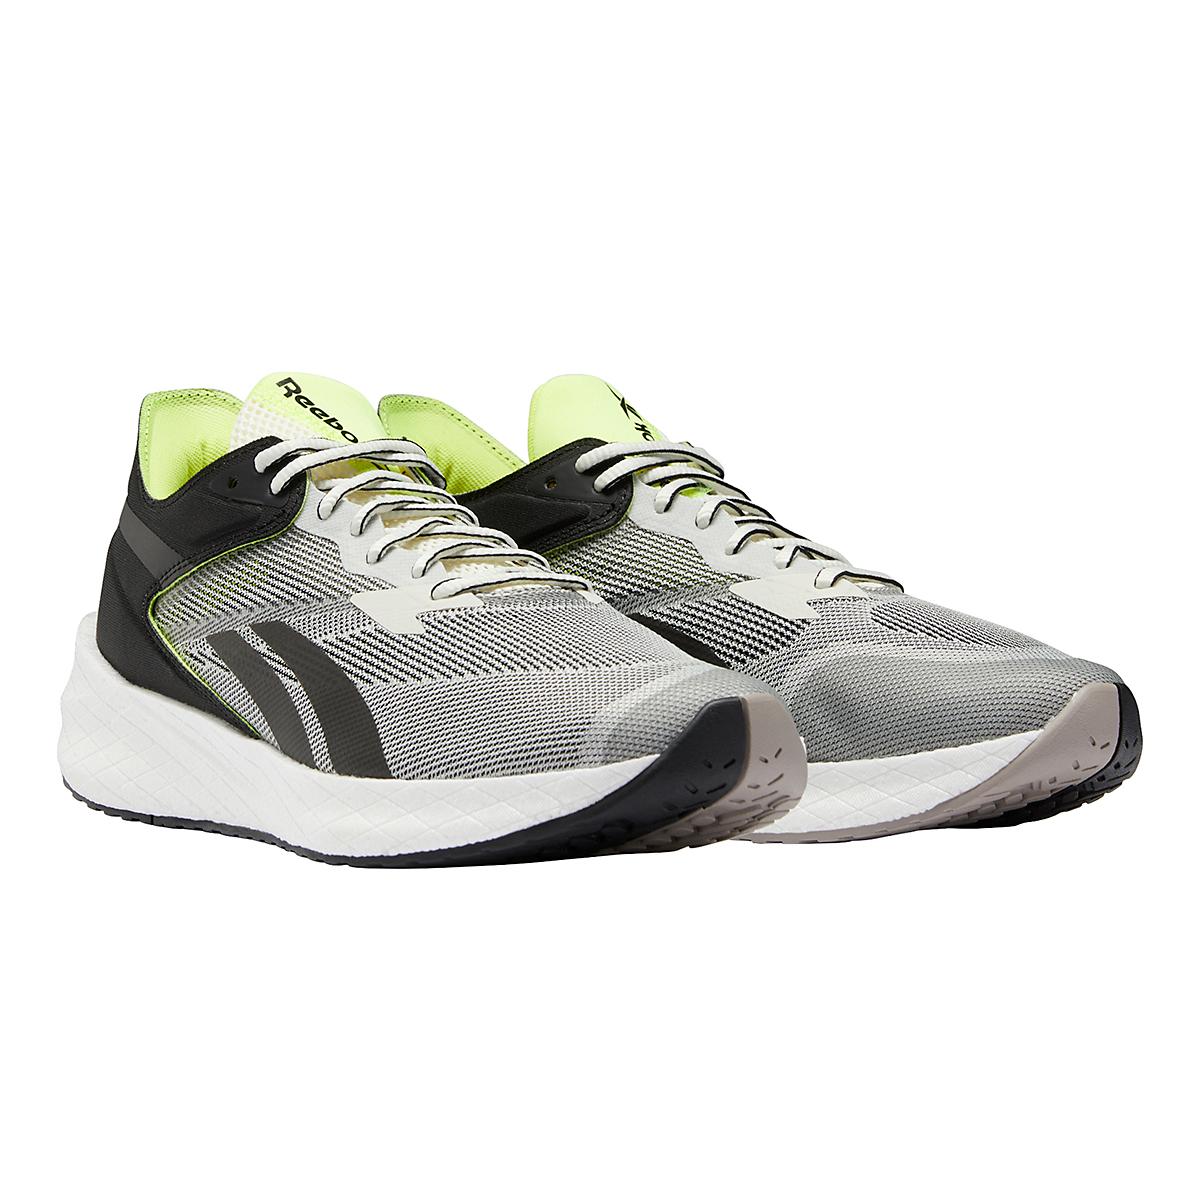 Men's Reebok Floatride Energy Symmetros Running Shoe - Color: Classic White/Core Black/Yellow Flare - Size: 7 - Width: Regular, Classic White/Core Black/Yellow Flare, large, image 3